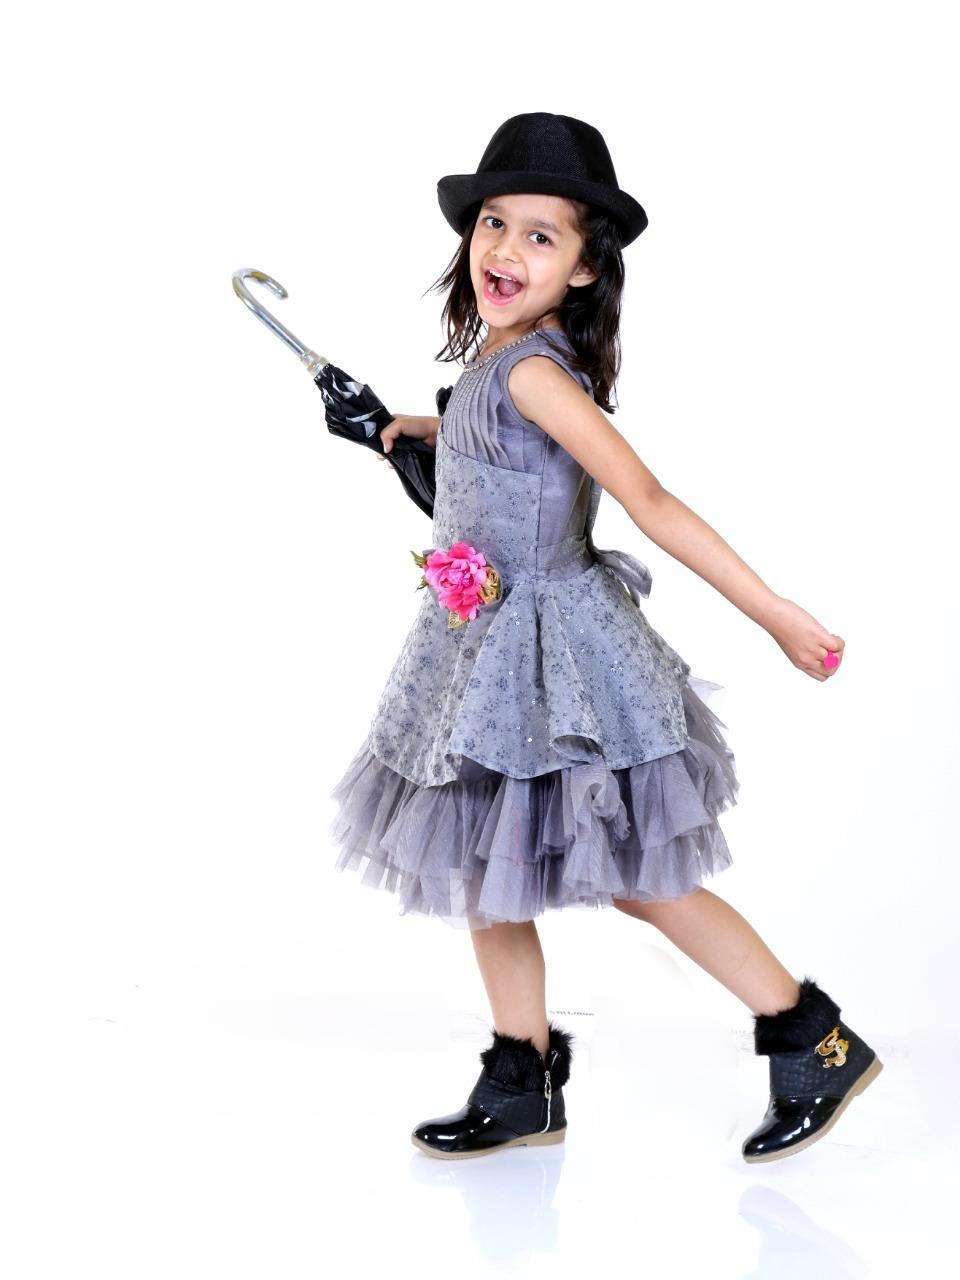 Chandigarh's 7-year-old Bhavisha bags 1st runner-up position in Super Kid Model Hunt